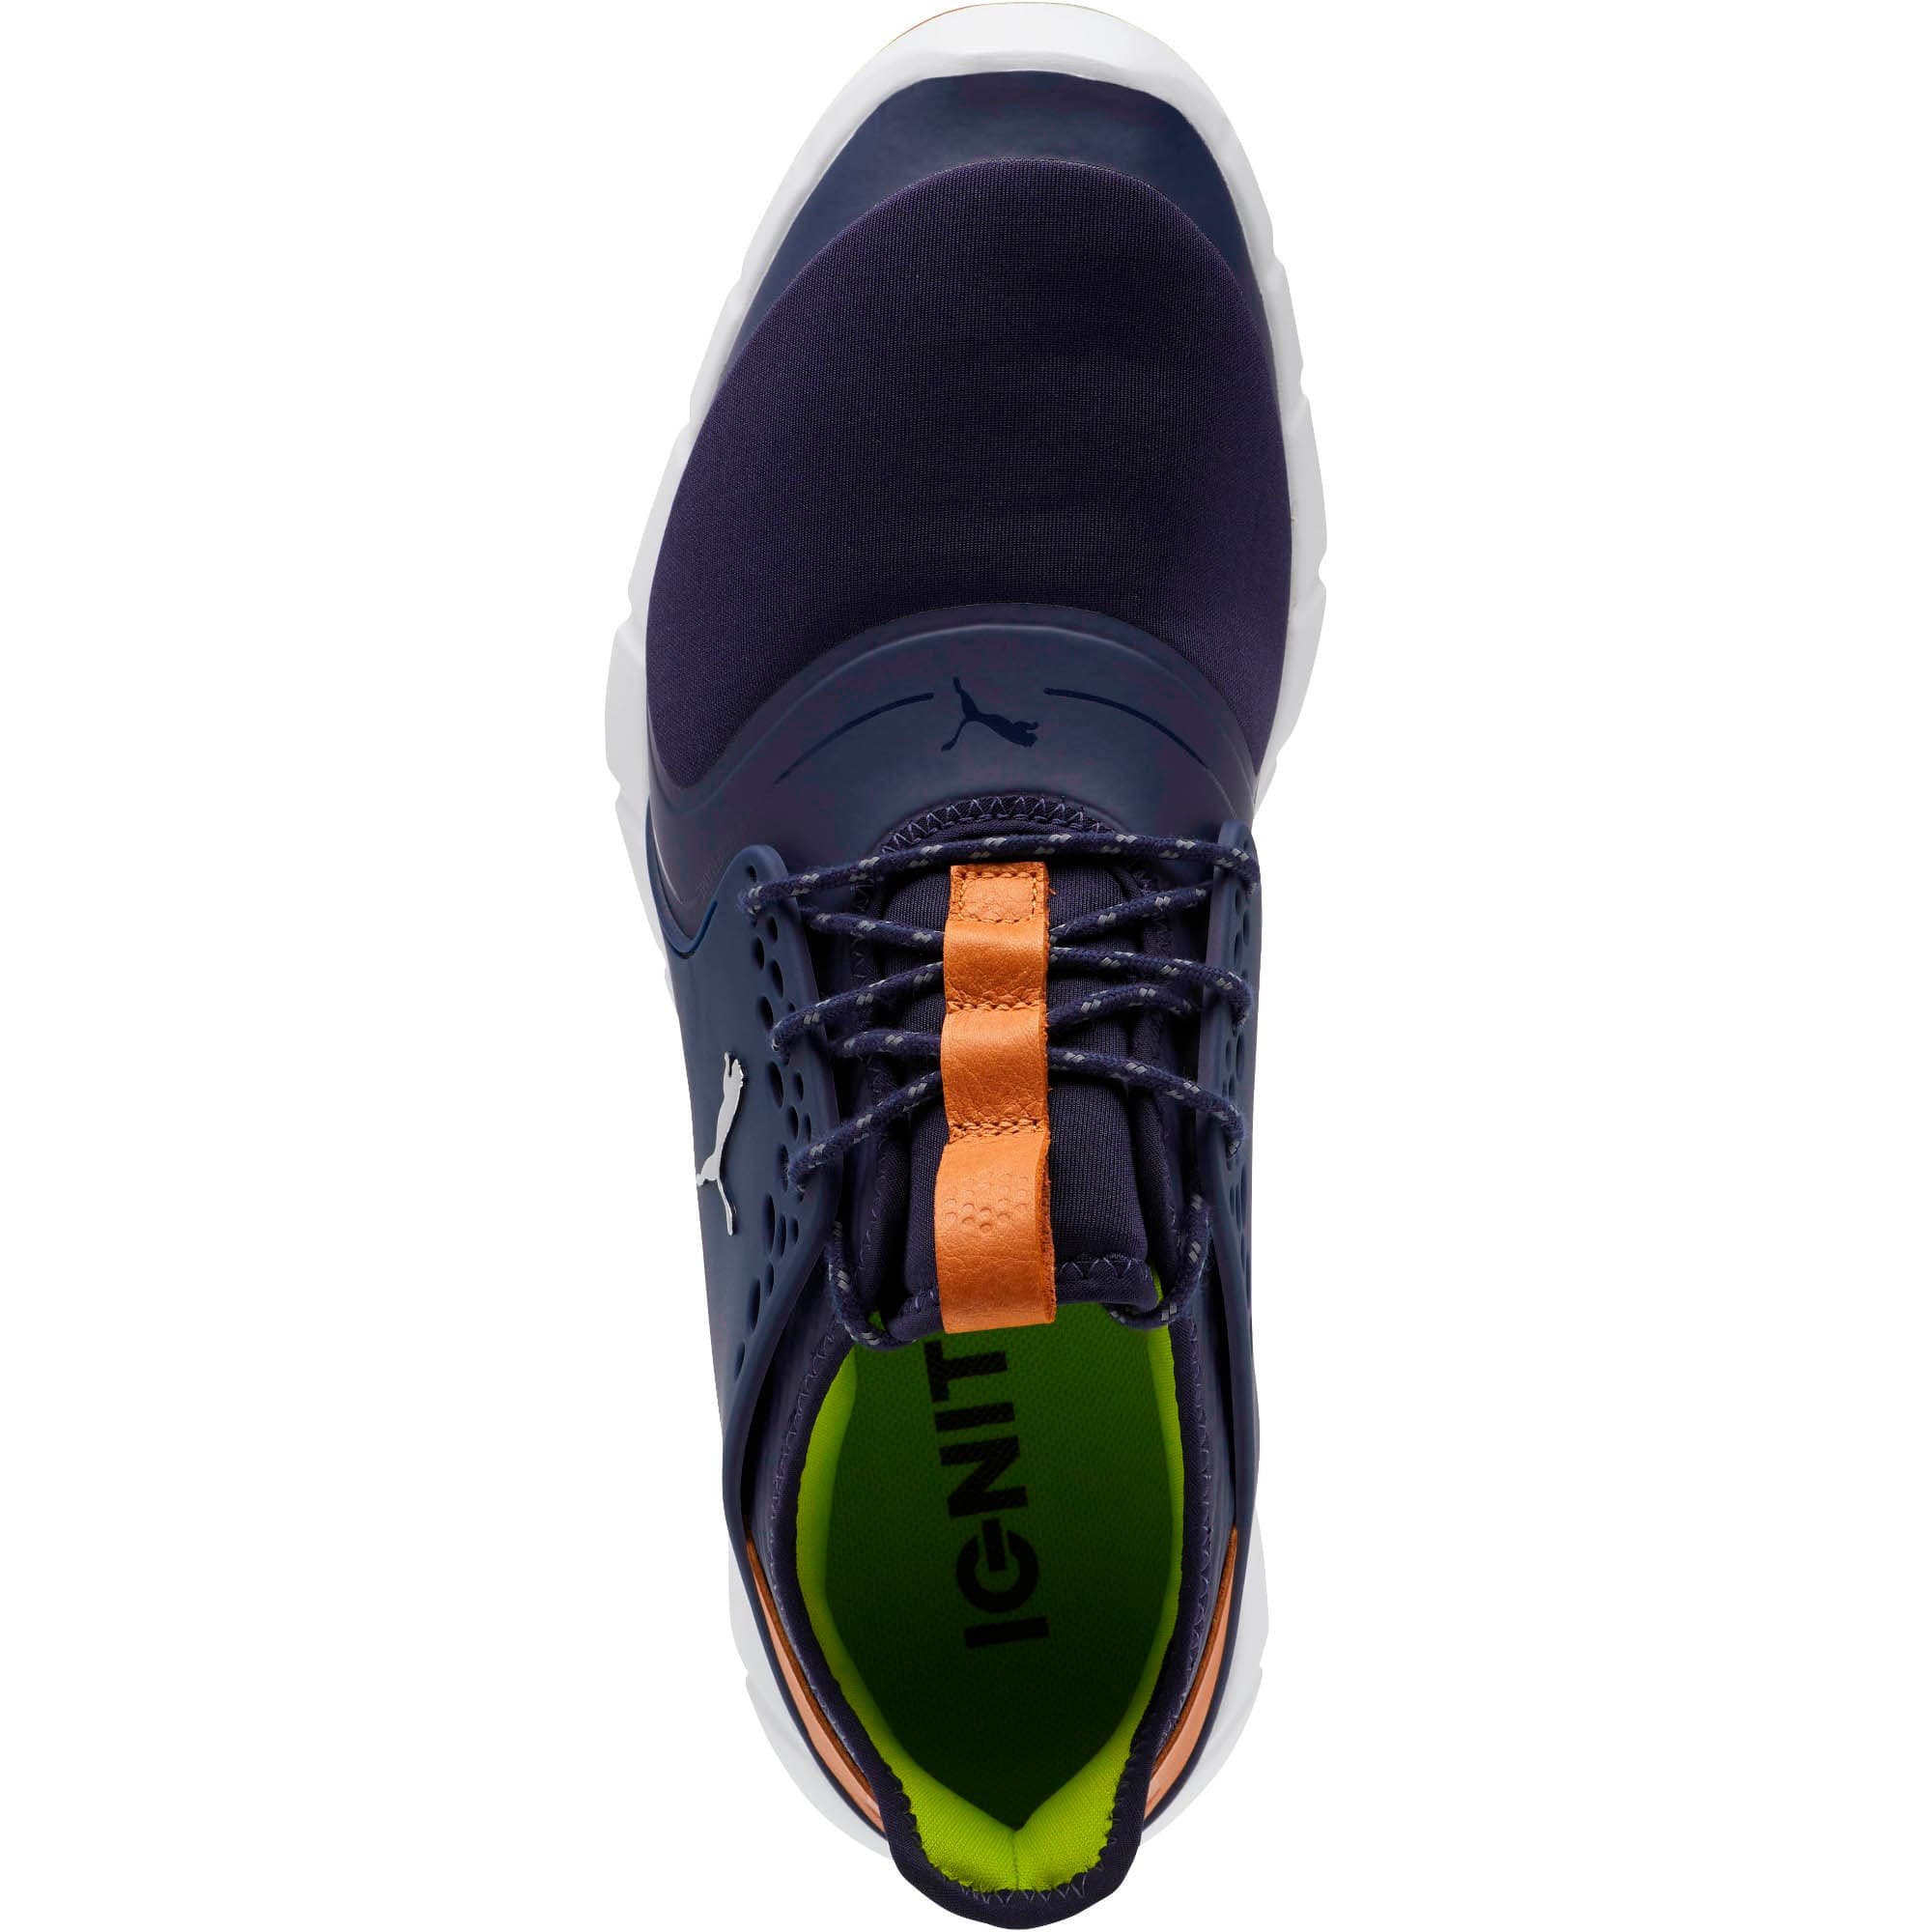 Thumbnail 5 of IGNITE PWRSPORT Men's Golf Shoes, Peacoat-Silver, medium